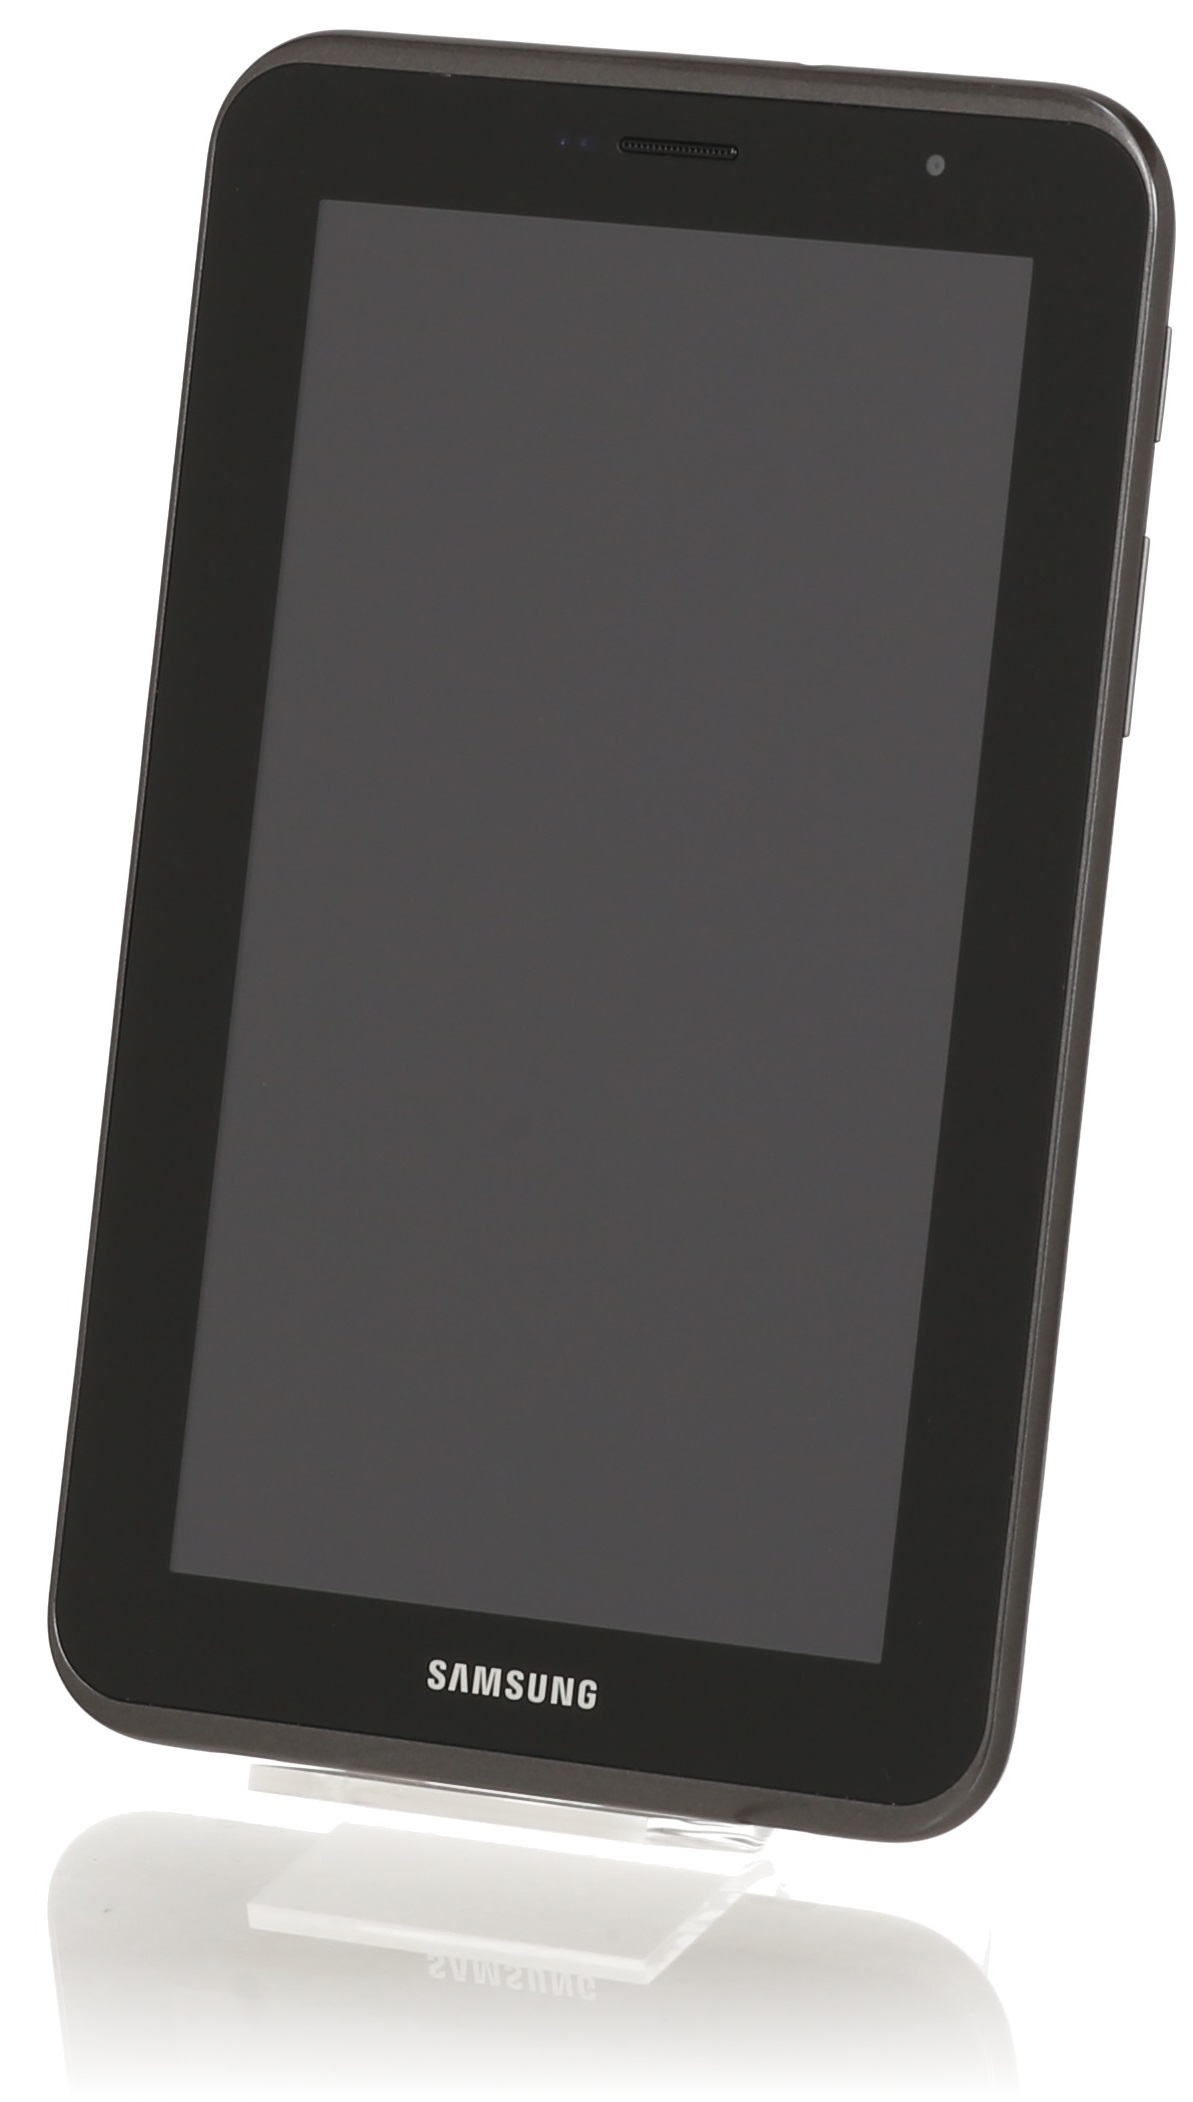 Samsung Galaxy Tab 2 7.0 7 16GB [Wi-Fi] titanium zilver